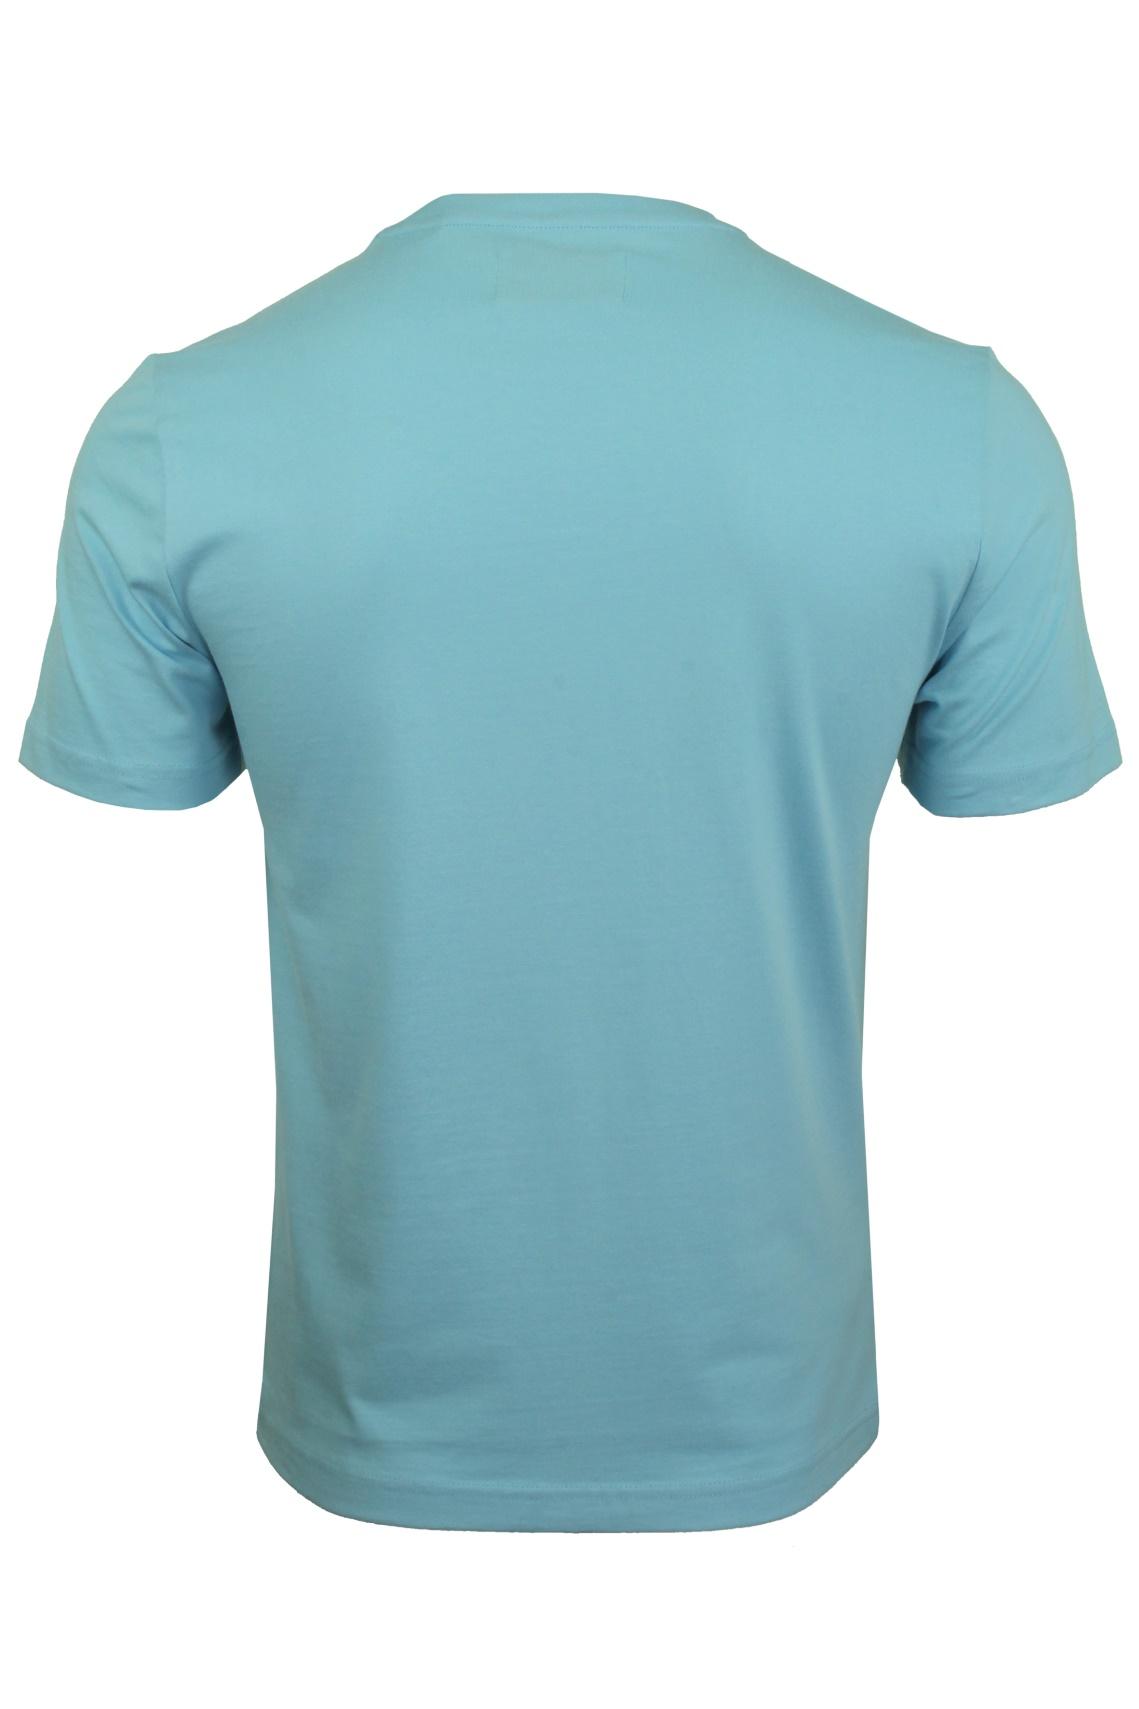 Mens-T-Shirt-by-Original-Penguin-Crew-Neck-Short-Sleeved thumbnail 8